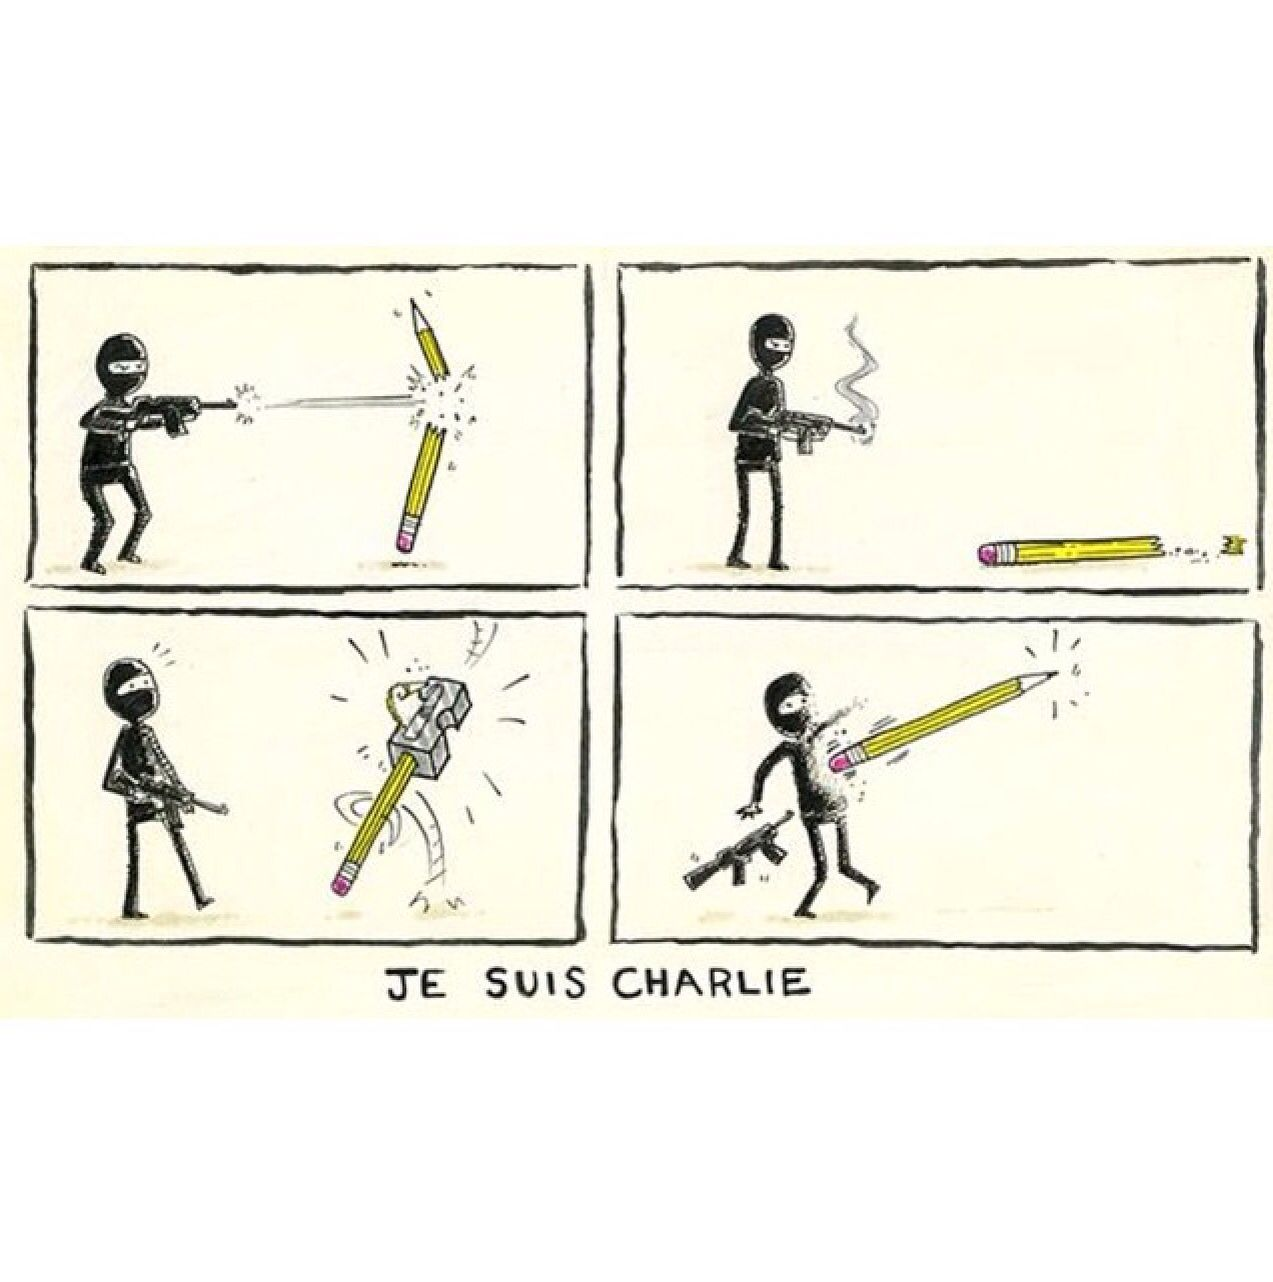 Je suis Charlie #Banksy